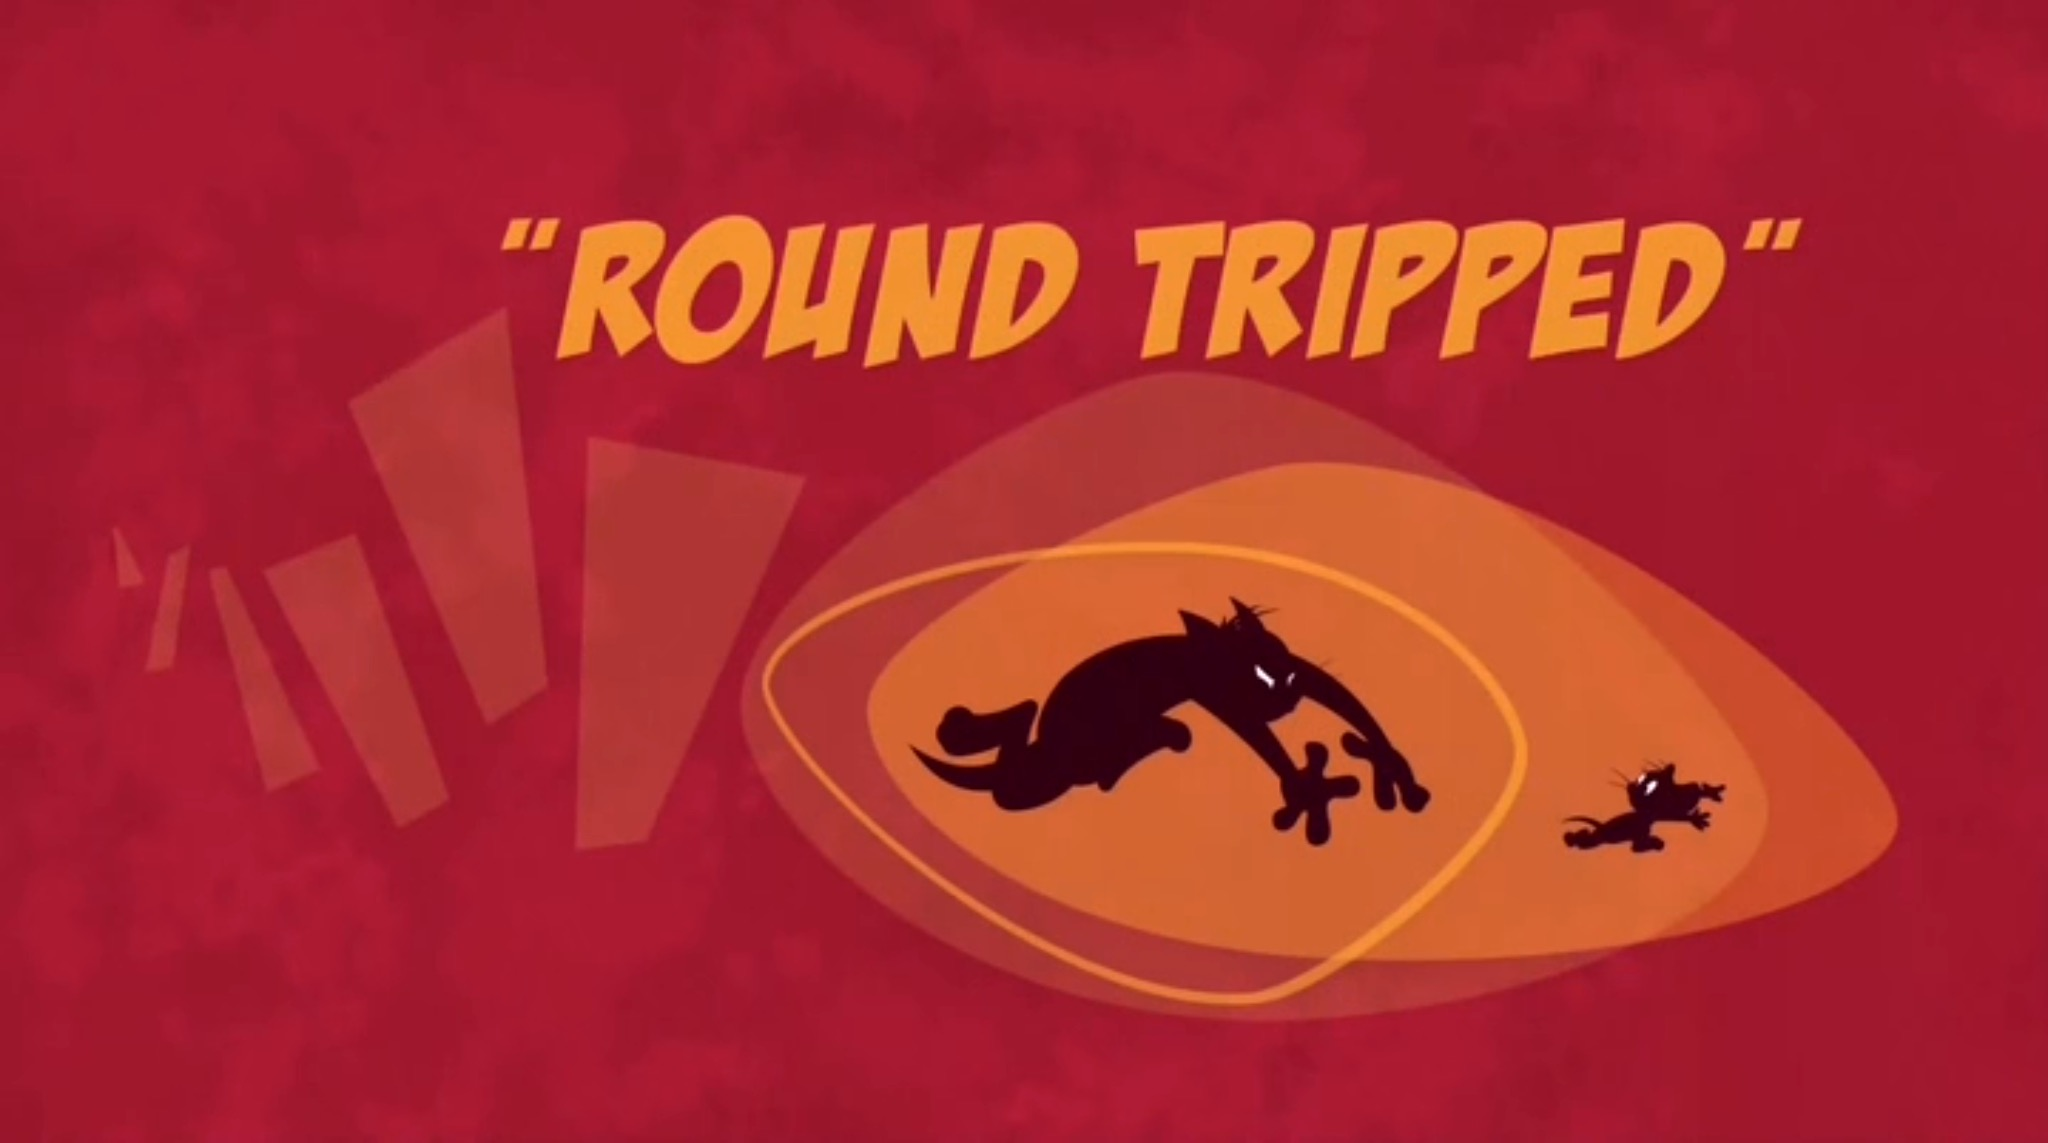 Round Tripped